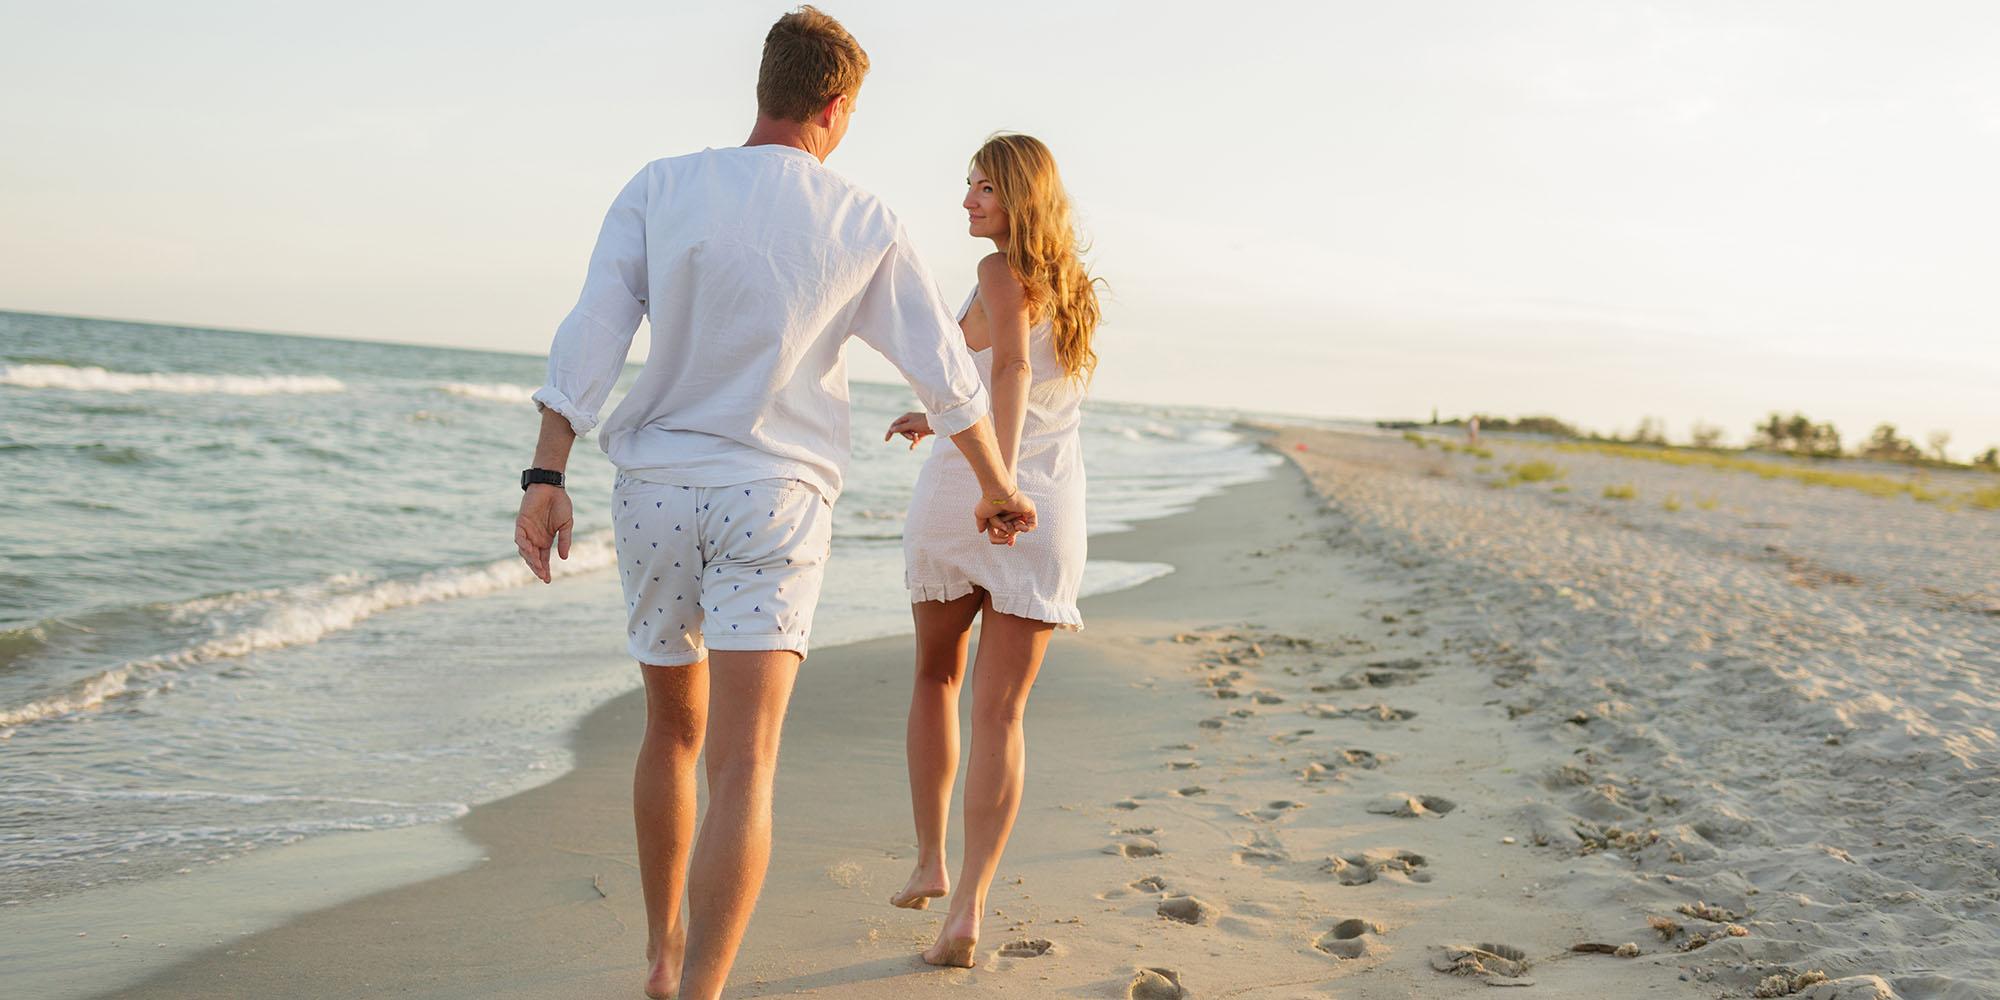 Young Beautiful Couple Walks Along The Seashore